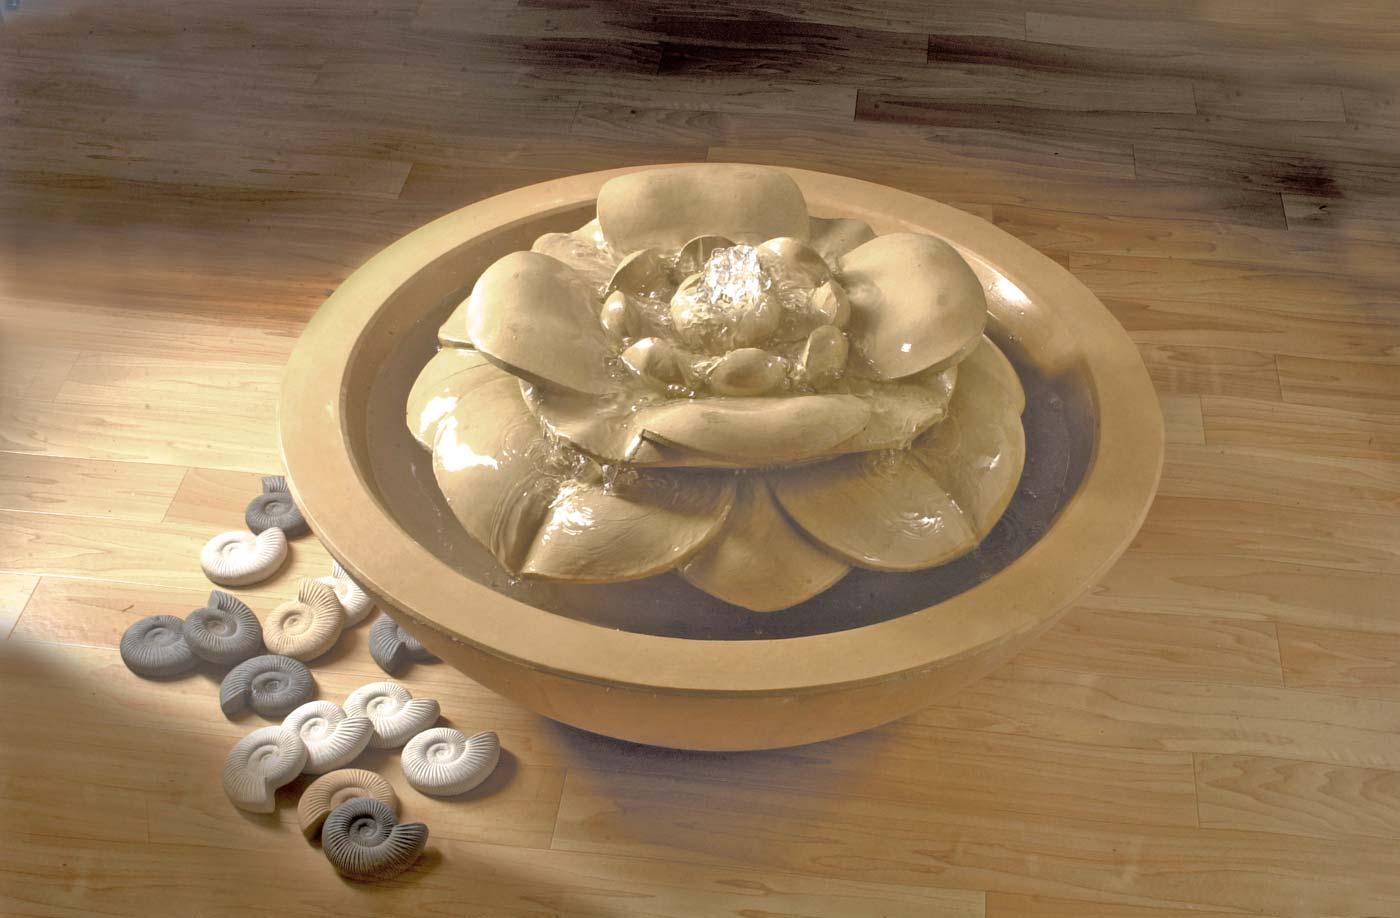 Lotus Flower Pebble Bowl Fountain Haddonstone Usa